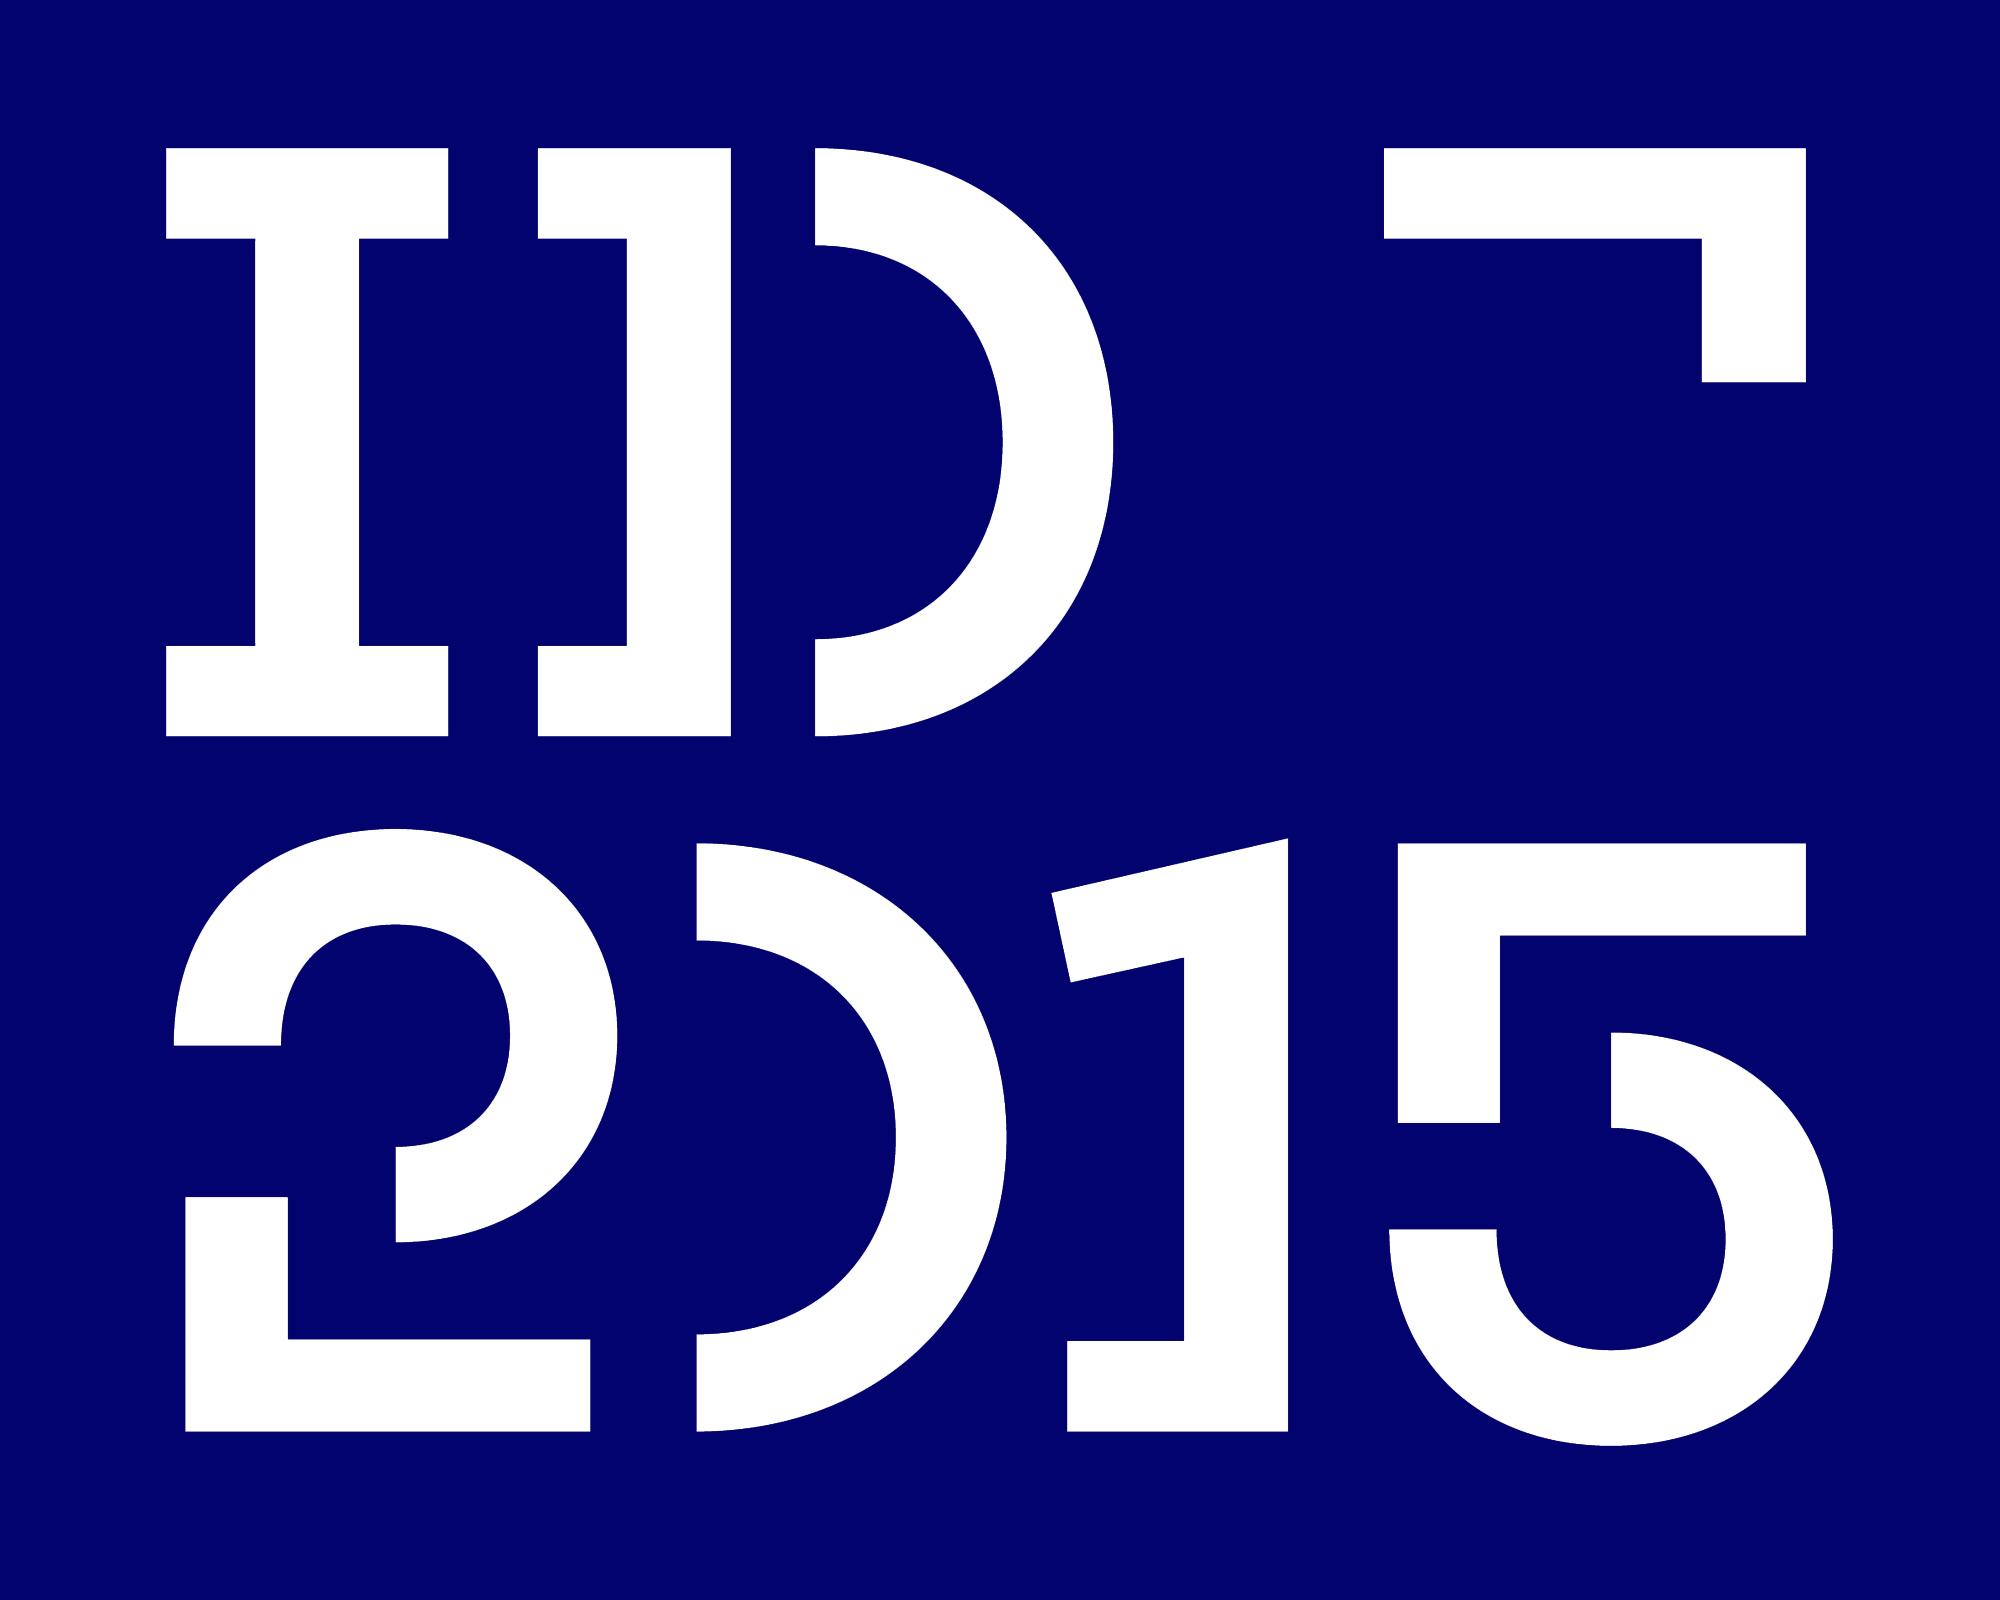 Cover image: ID2015 Visual Identity